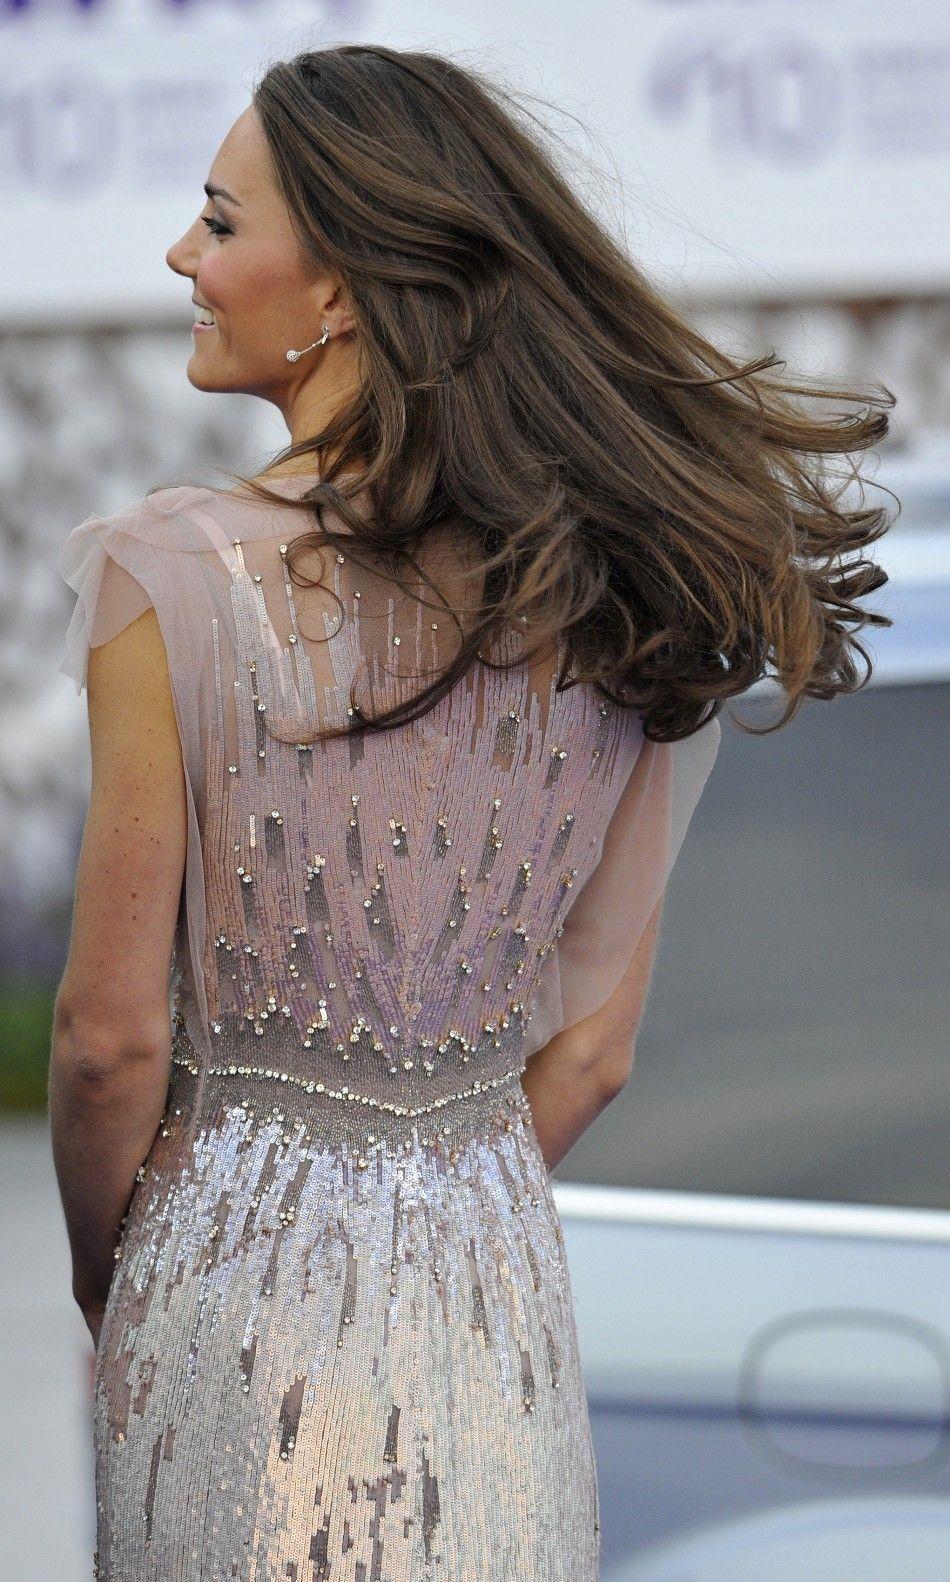 Lace dress kate middleton  Pin by Jennifer D Hulbert on Catherine Duchess of Cambridge